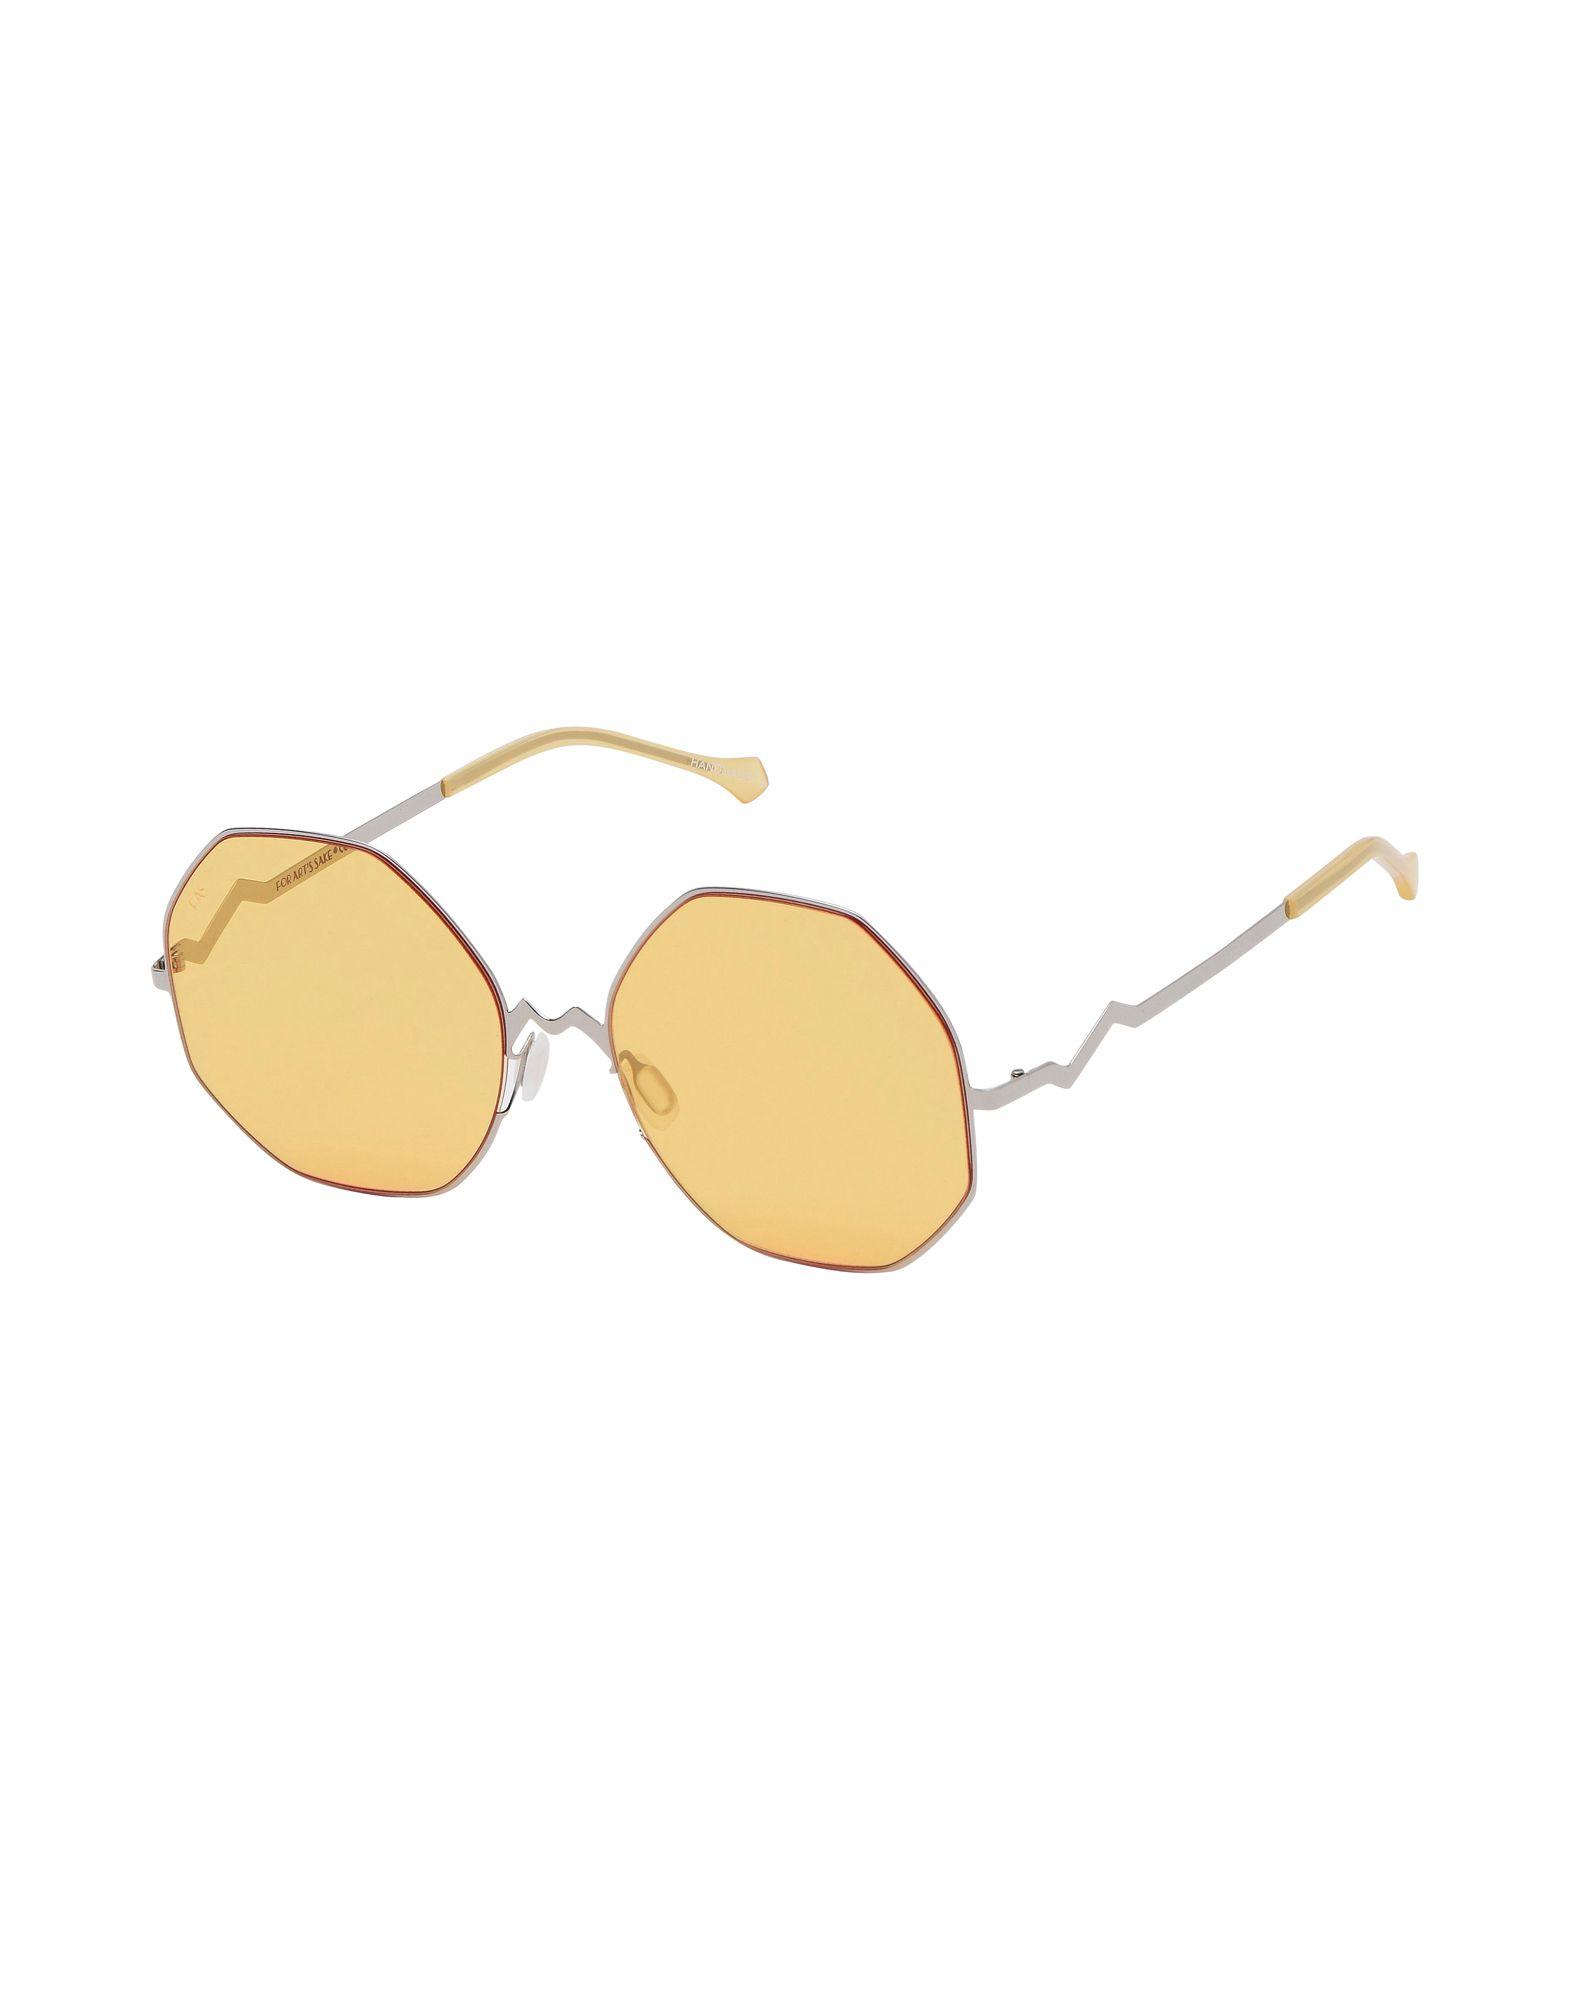 FOR ART'S SAKE Солнечные очки